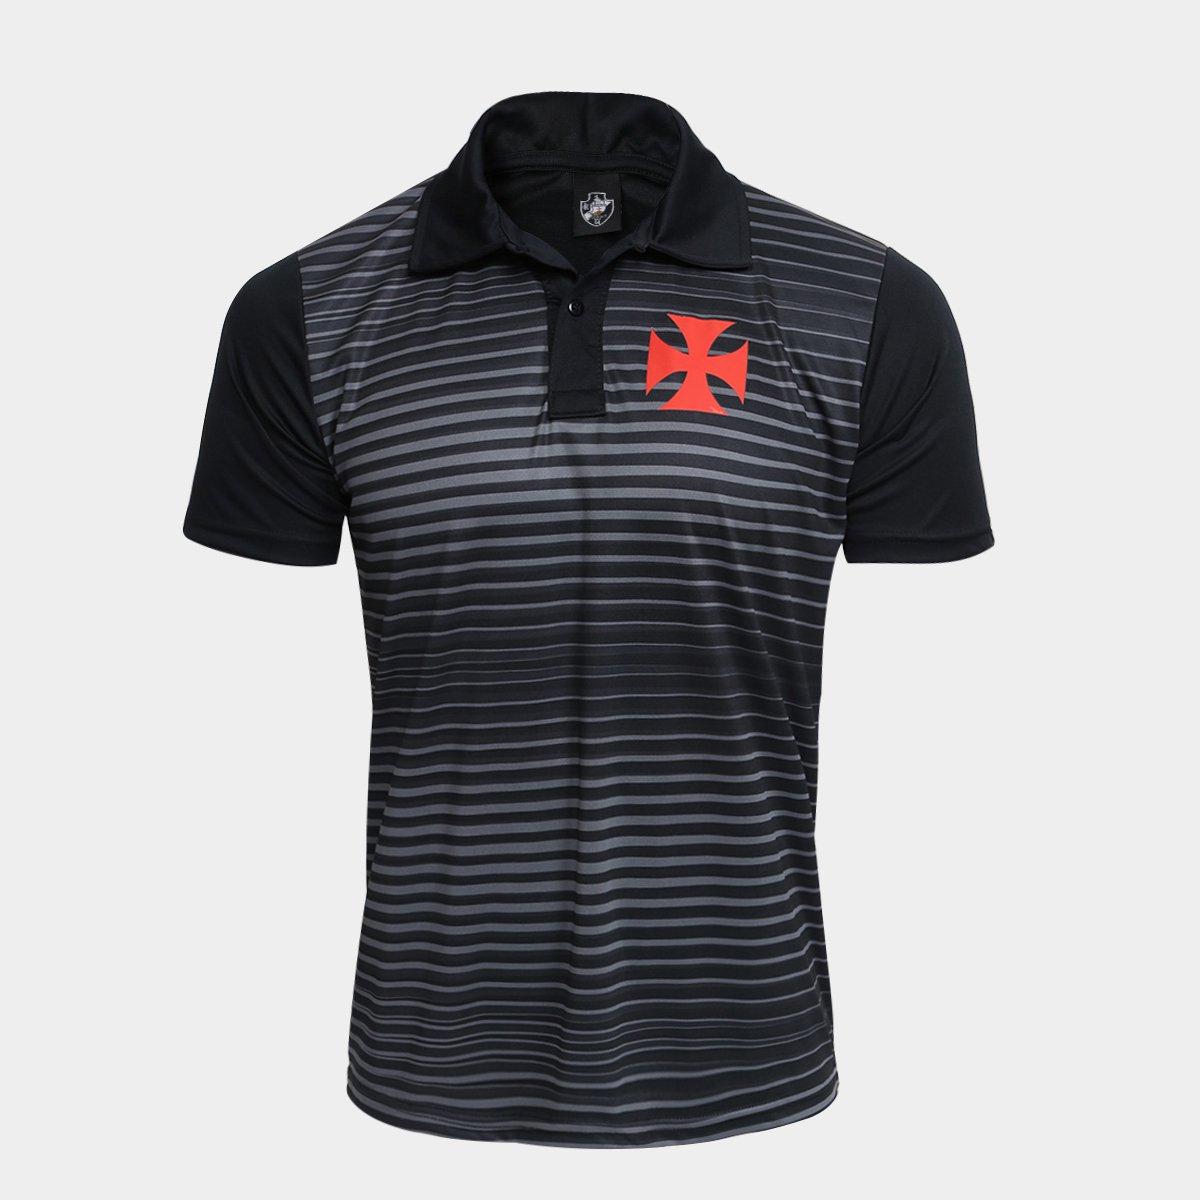 Camisa Polo Vasco Spike Masculina - Compre Agora  5e5fe0fcdbf25